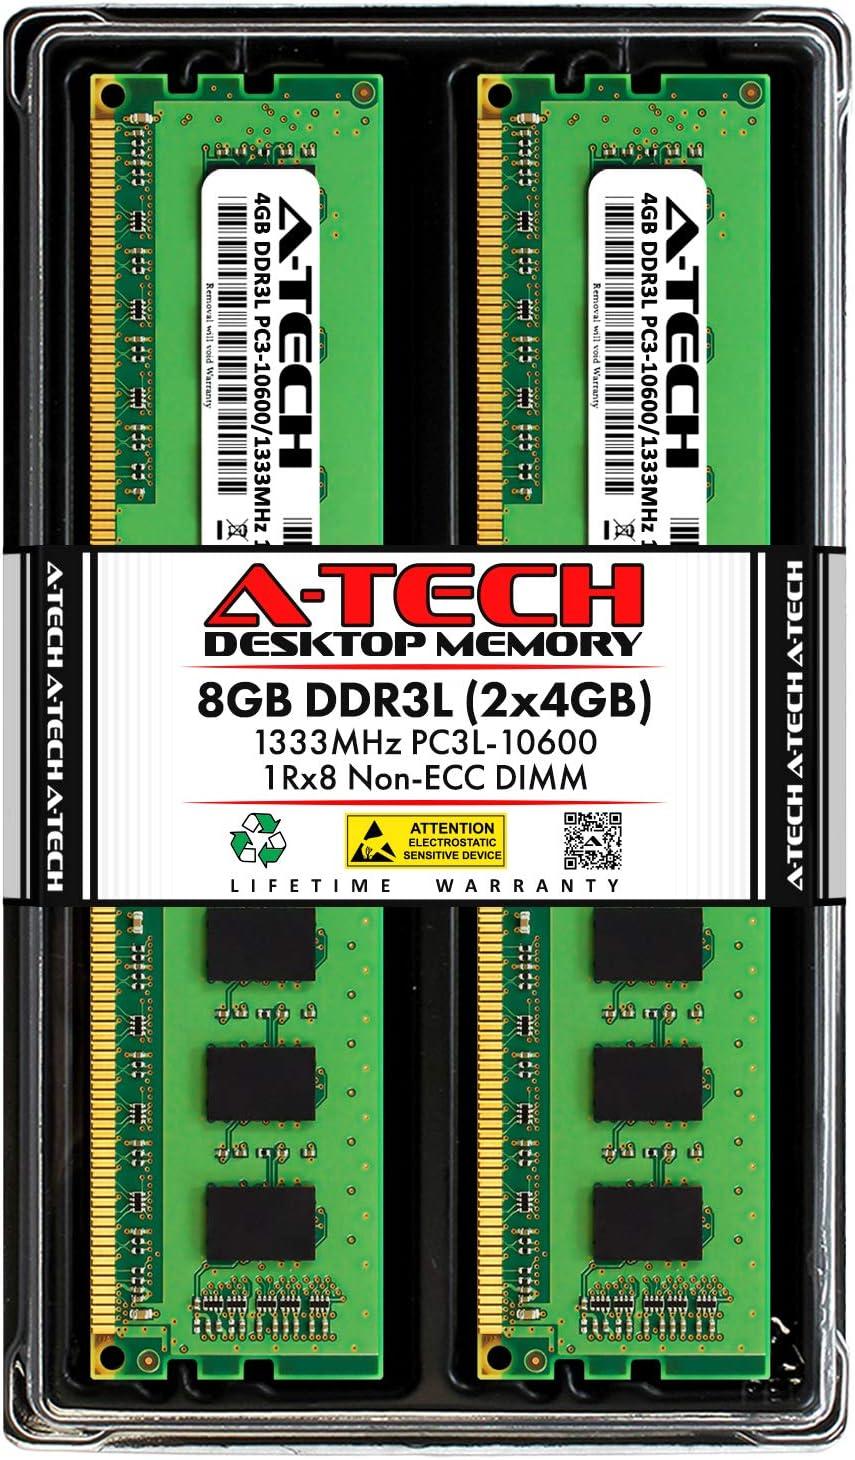 A-Tech 8GB DDR3 / DDR3L 1333MHz Desktop Memory Kit (2 x 4GB) PC3-10600 Non-ECC Unbuffered DIMM 240-Pin 1Rx8 1.35V Low Voltage Single Rank Computer RAM Upgrade Sticks